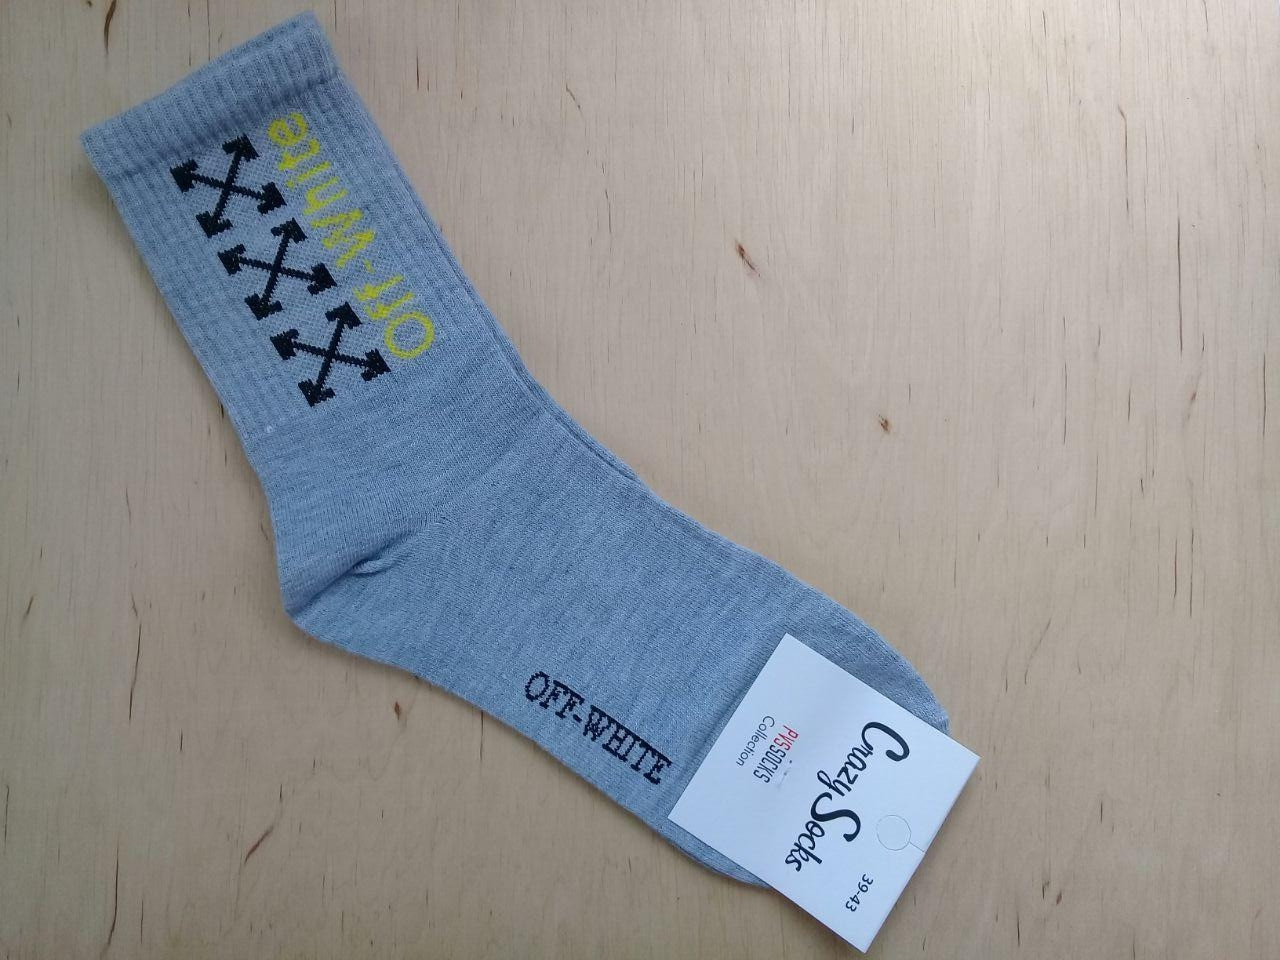 Модные молодежные носки Crazy Socks размер 39-43 OFF WHITE светло серый